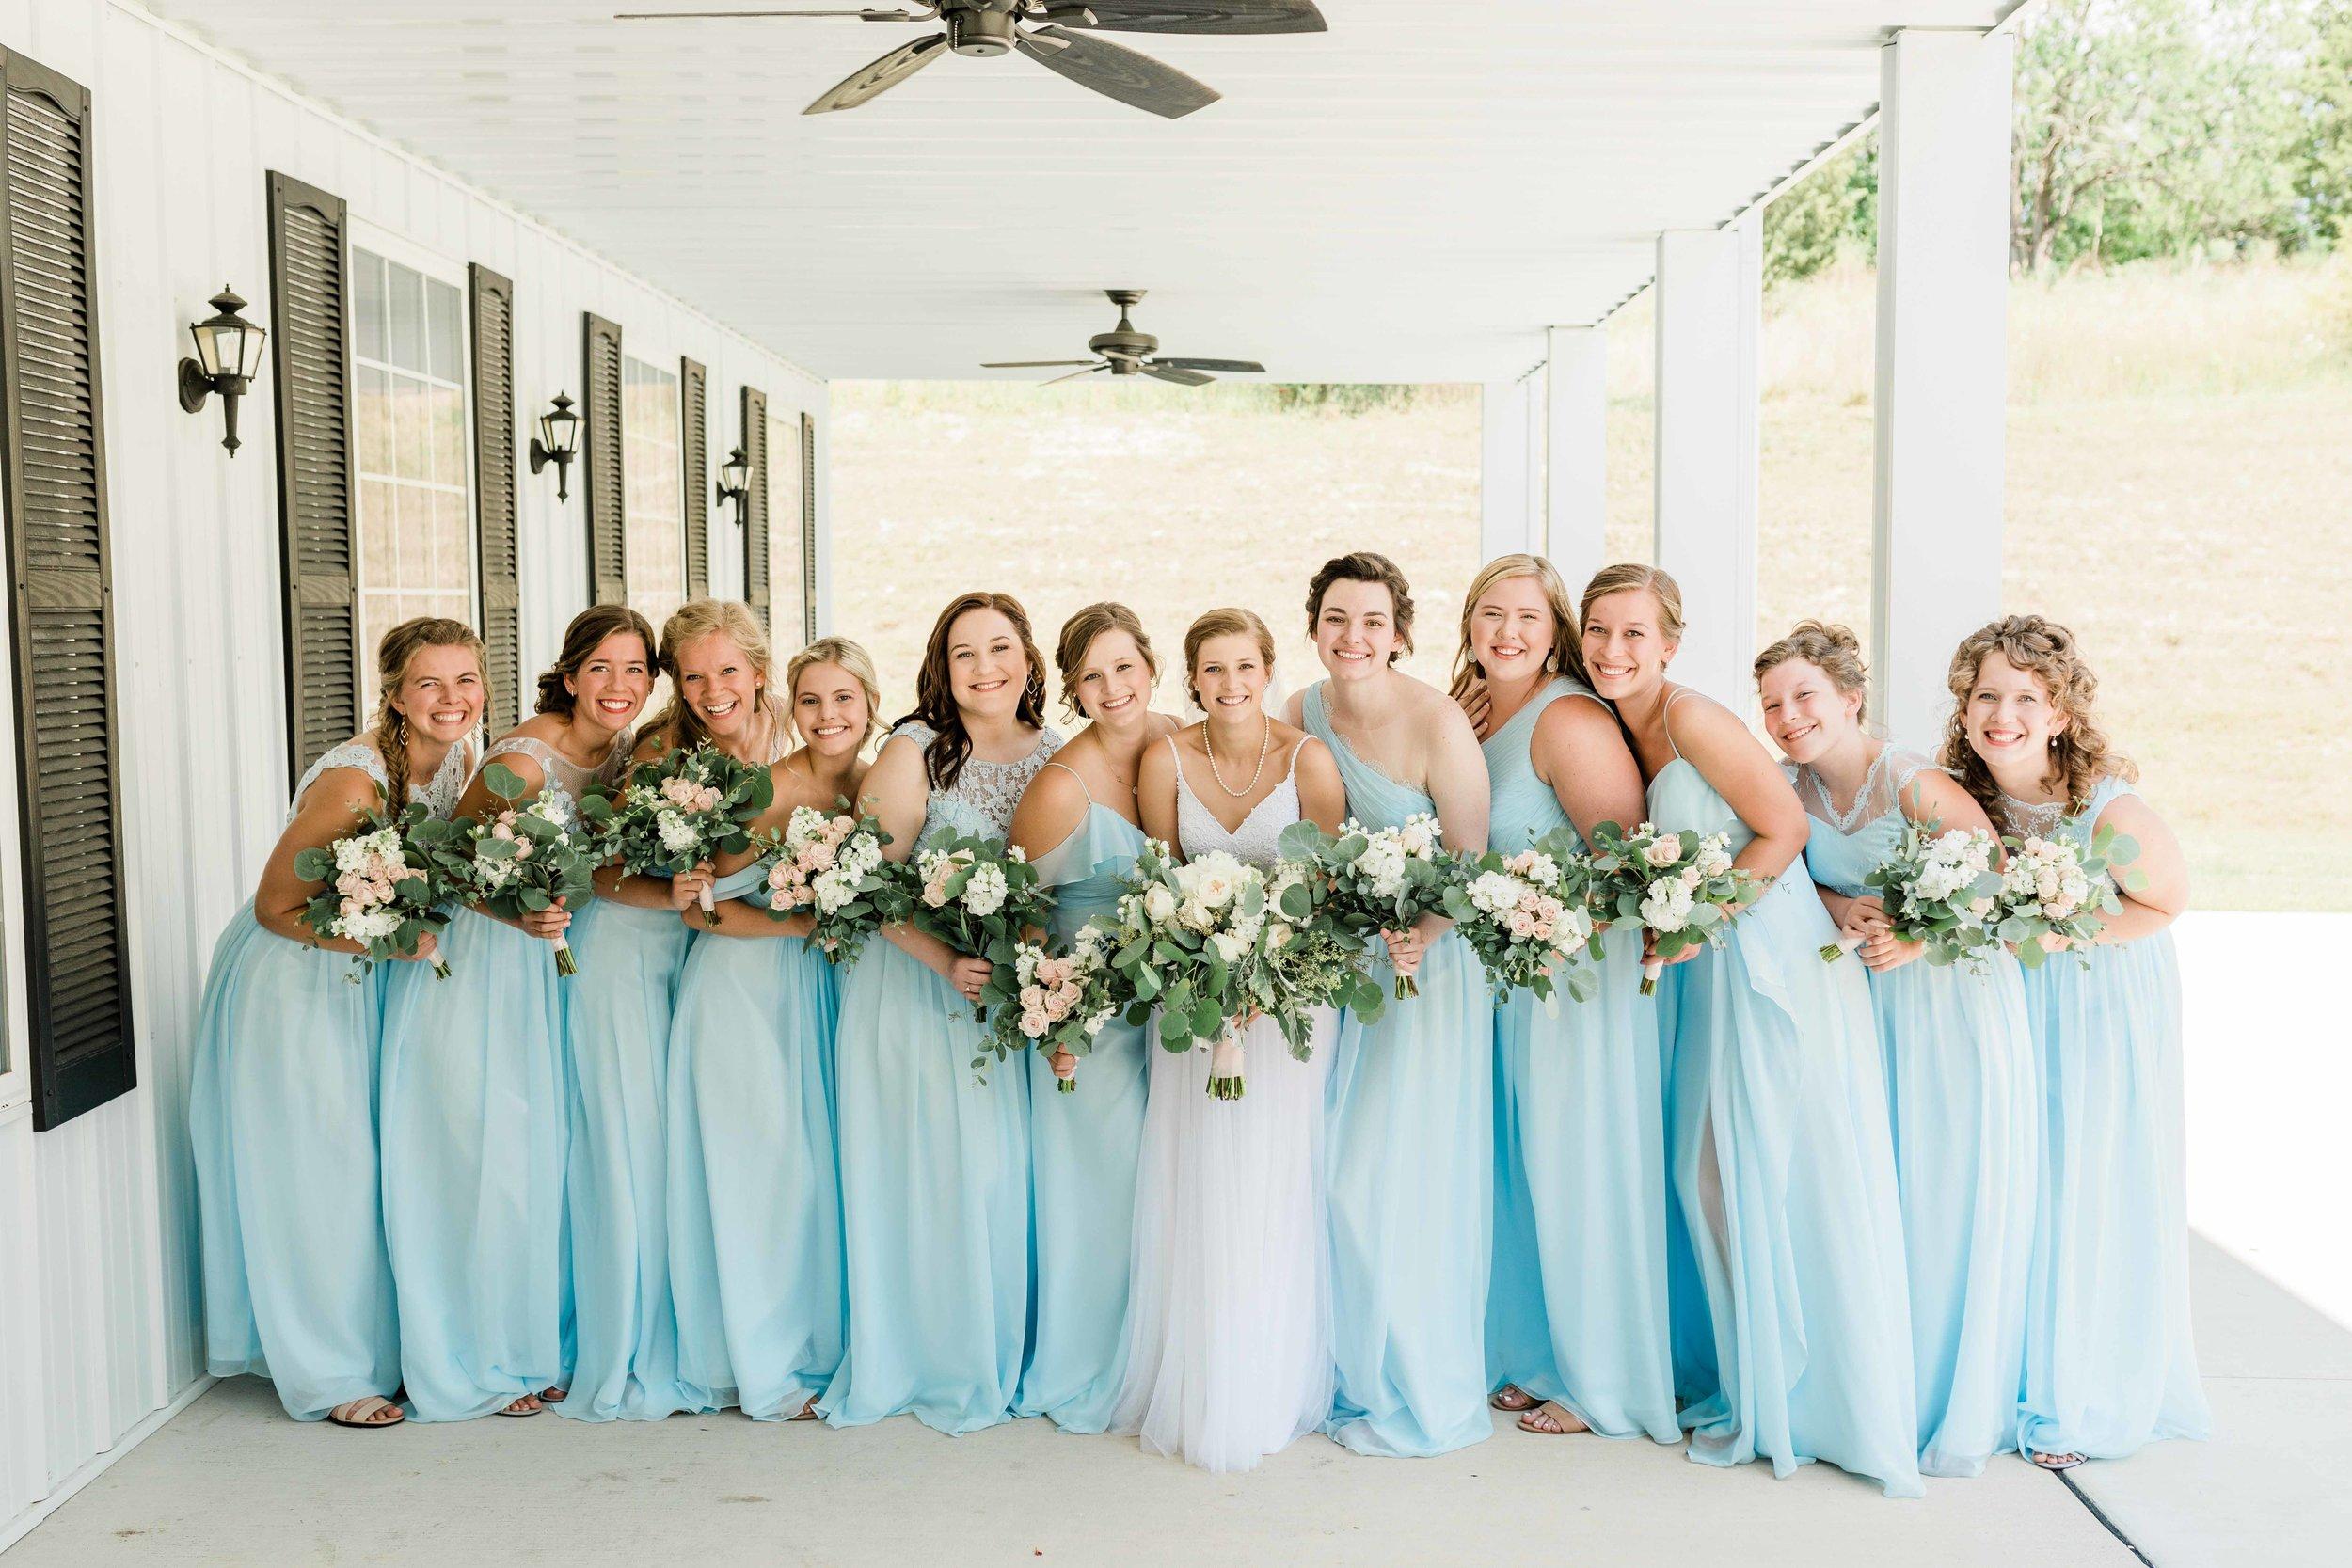 rosewood manor miamisburg ohio wedding-6.jpg